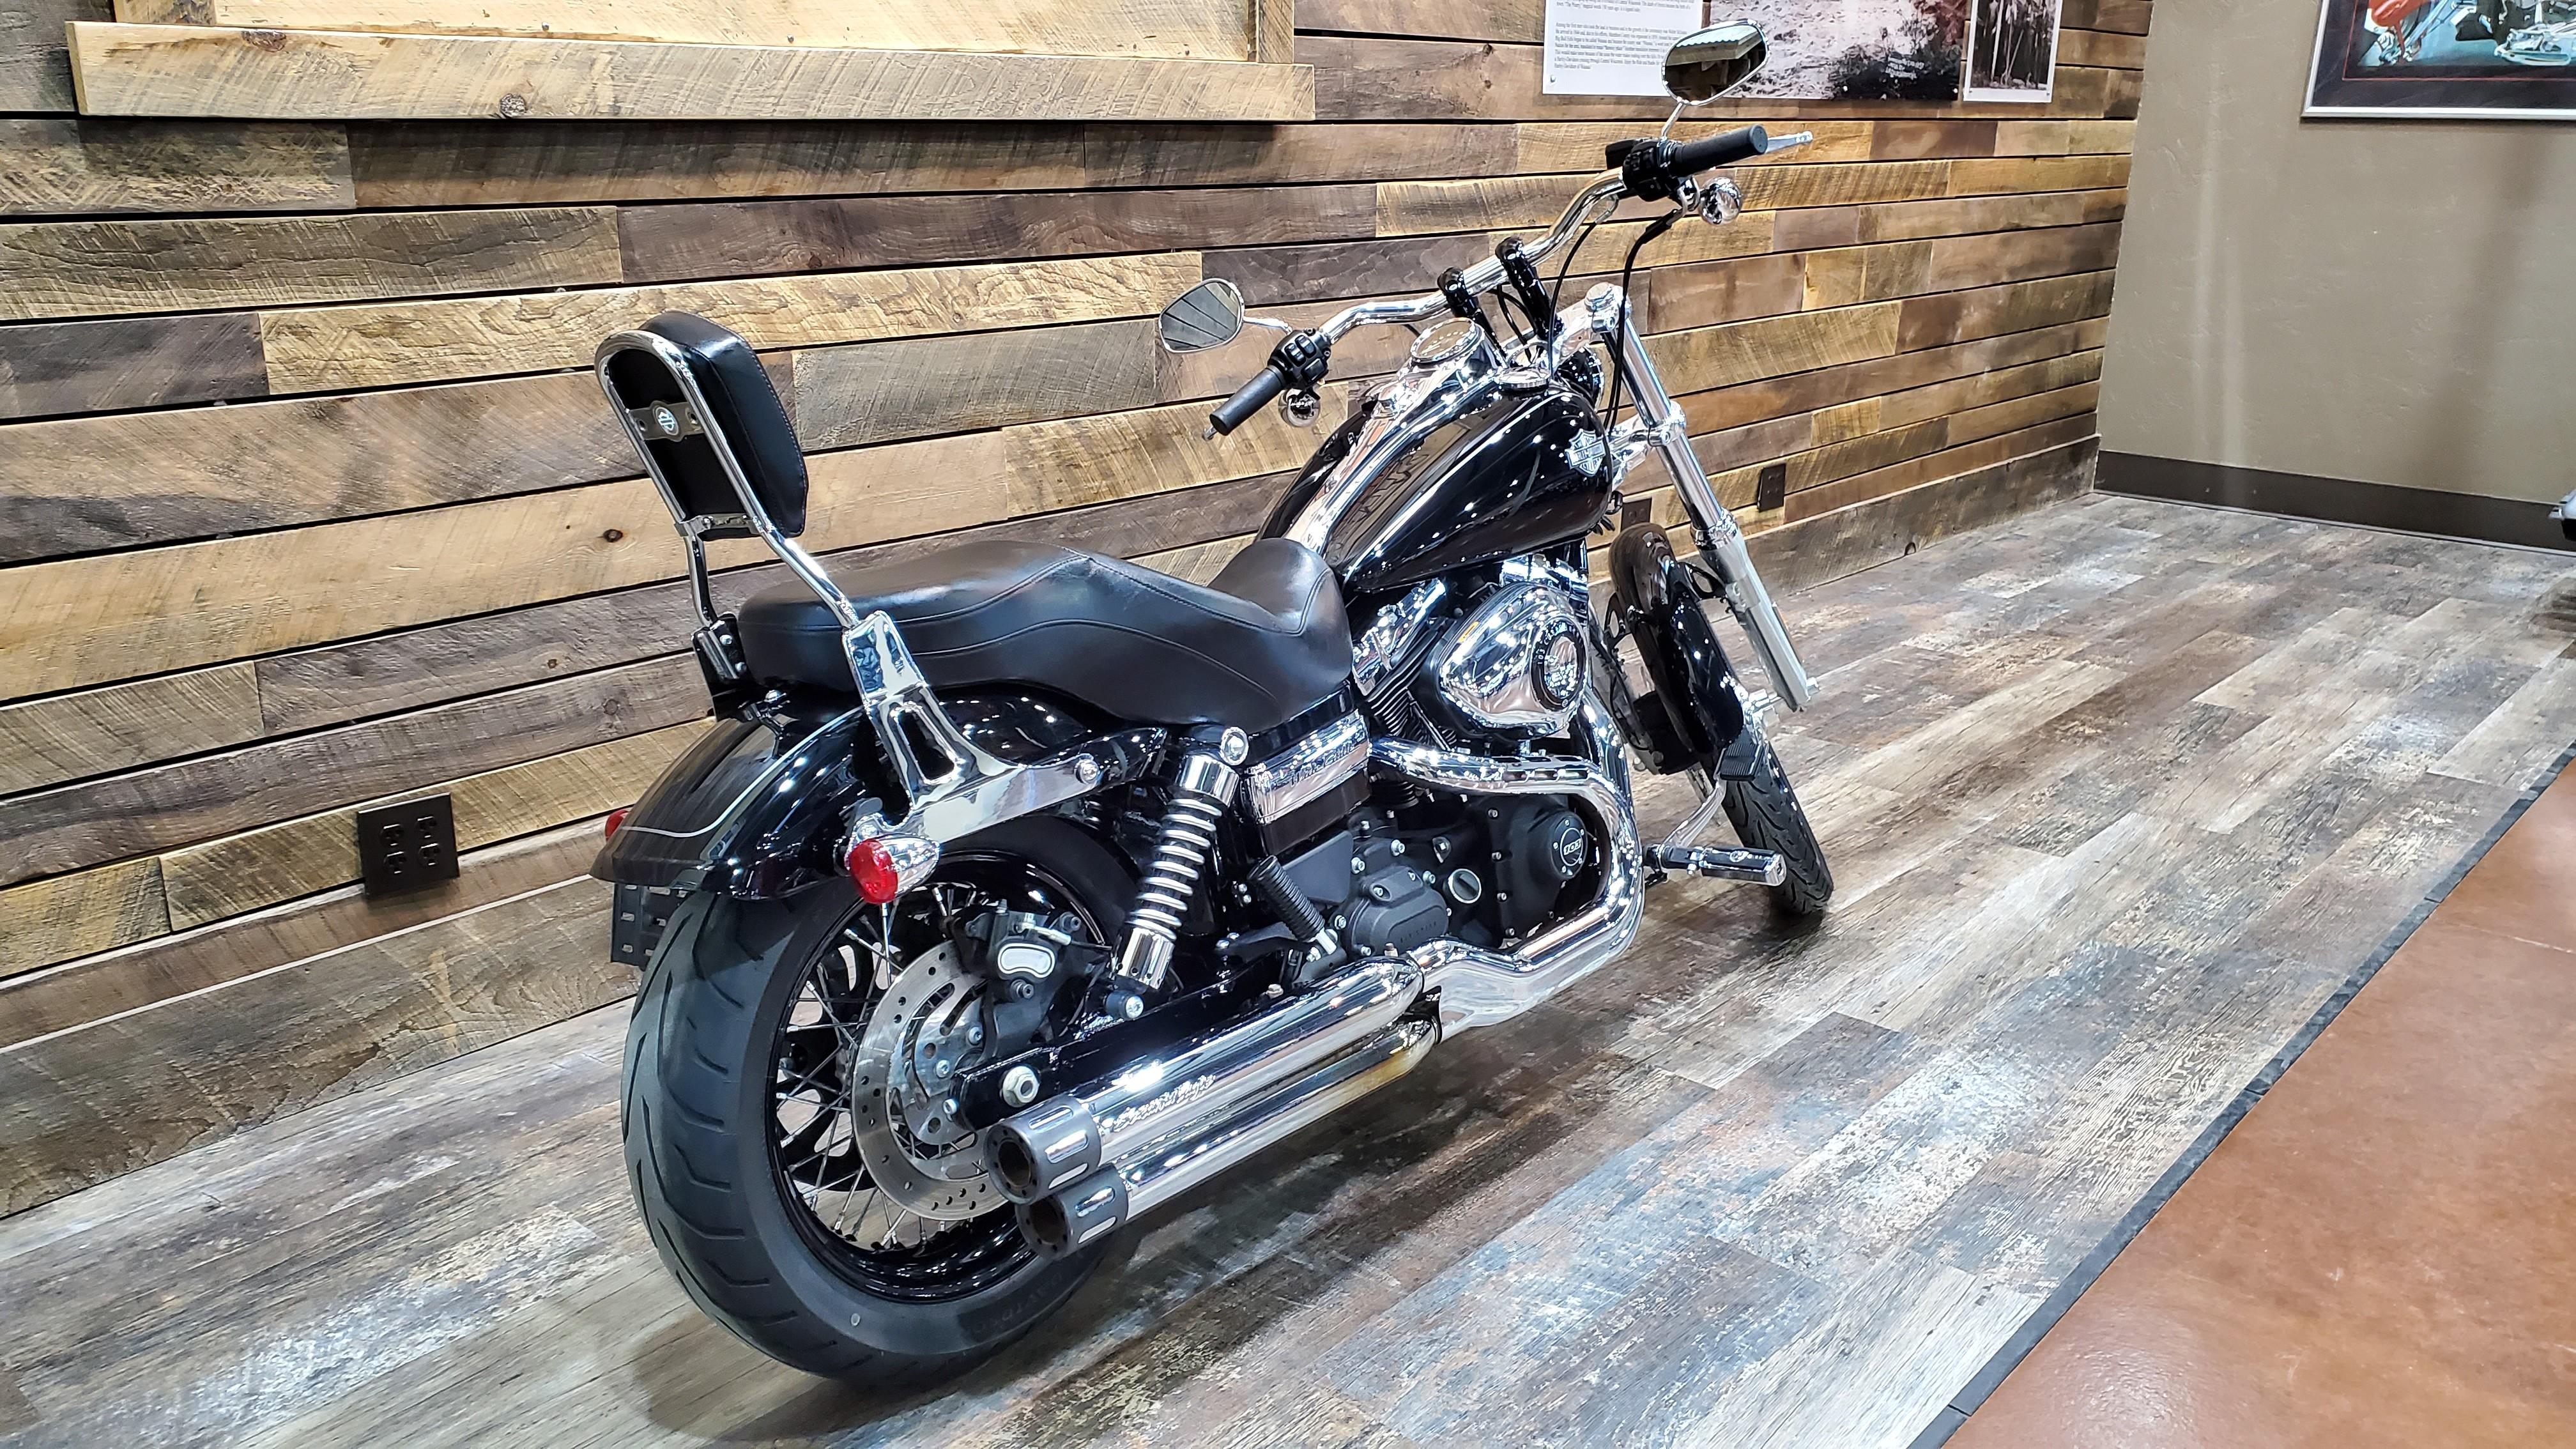 2014 Harley-Davidson Dyna Wide Glide at Bull Falls Harley-Davidson